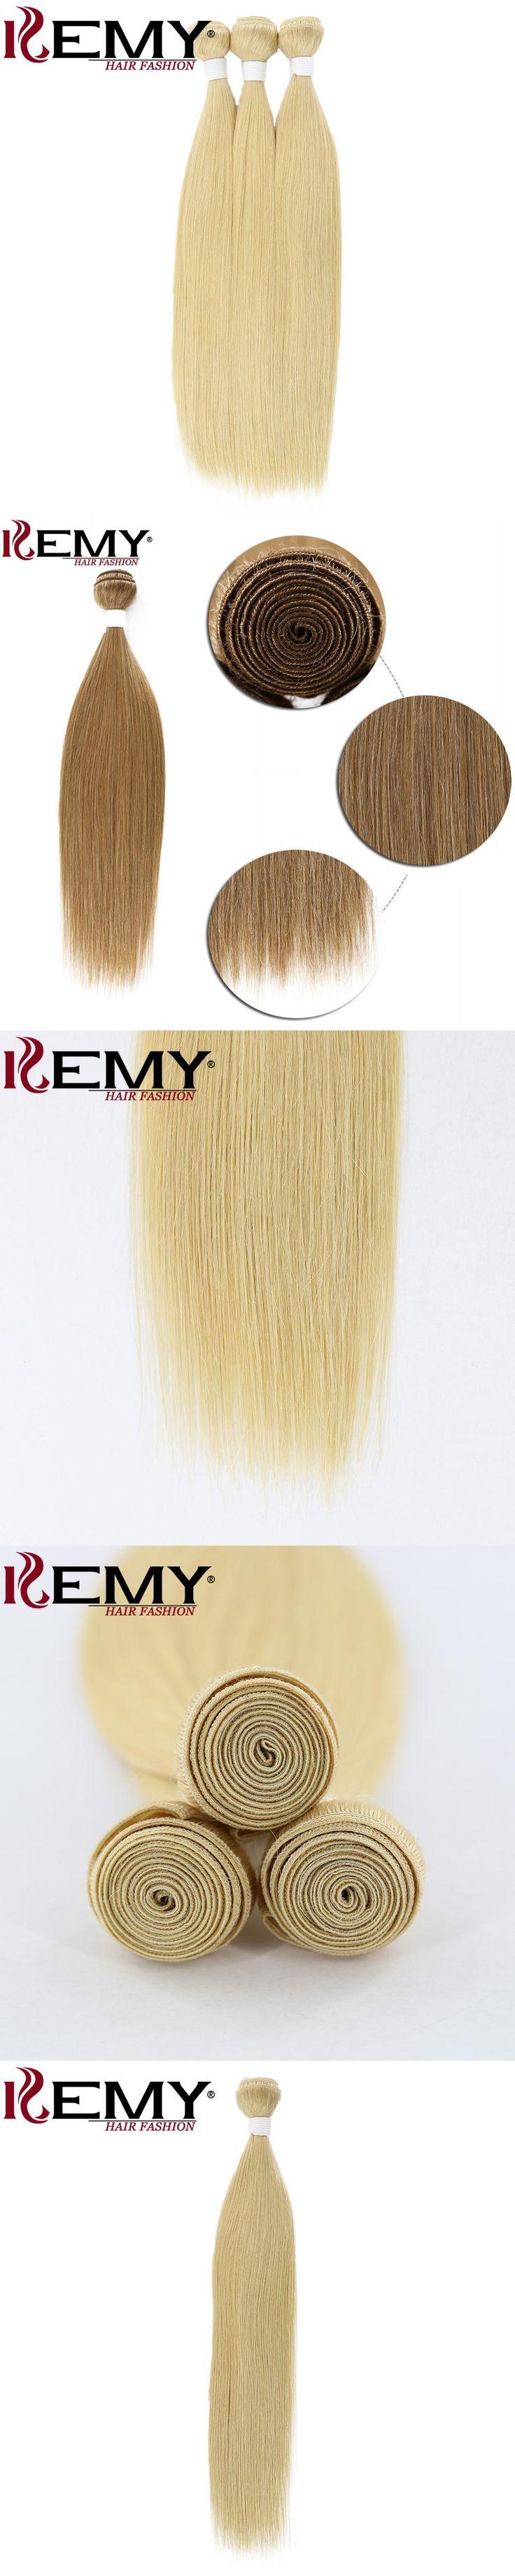 "KEMY HAIR Blone hair  1Pcs/Pack 18"" Pre-colored Human Hair Weave Bundles Non-remy Straight 100% Brazilian Human Hair extensions"